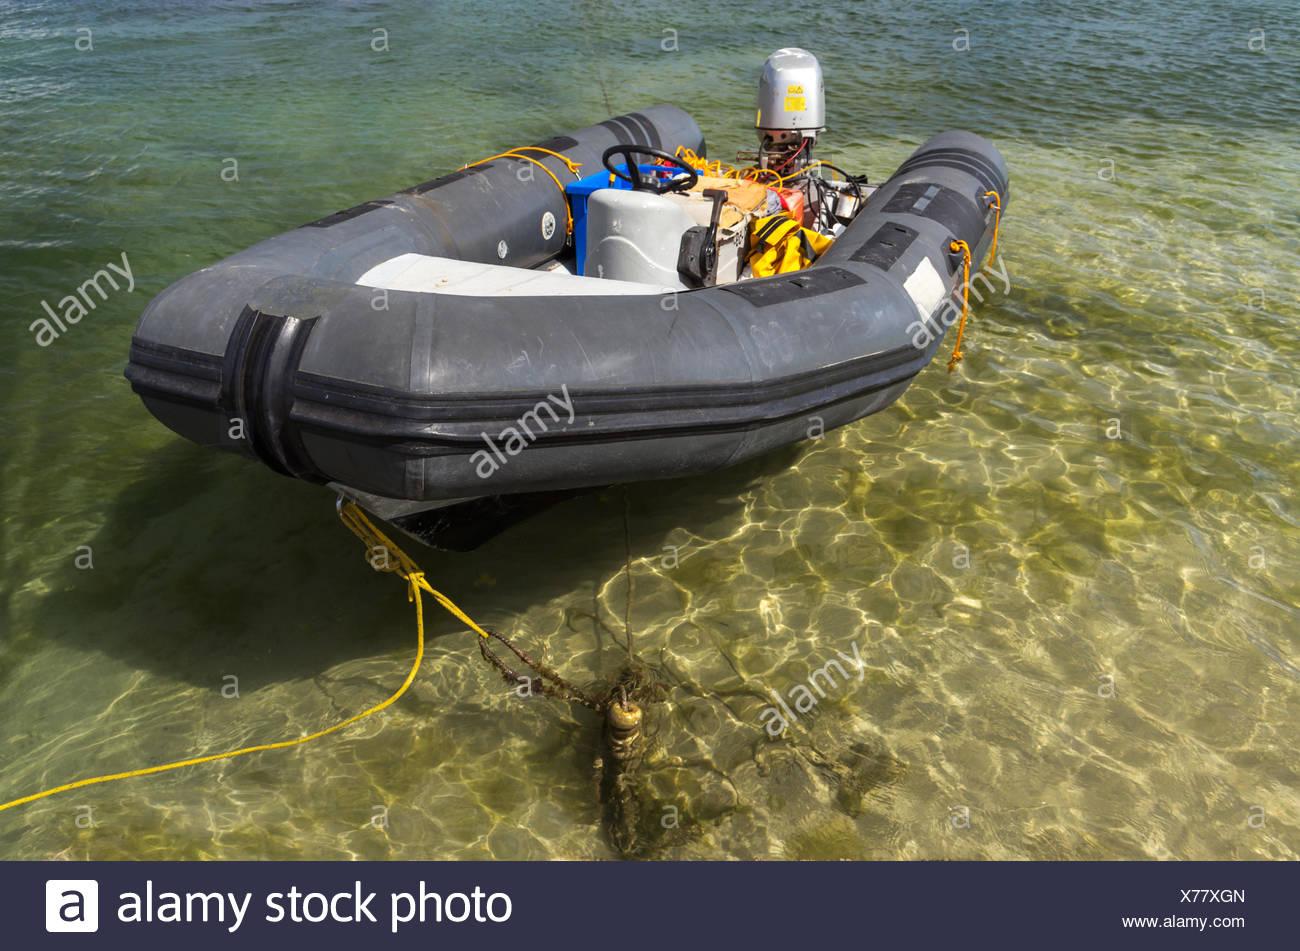 dinghy - Stock Image